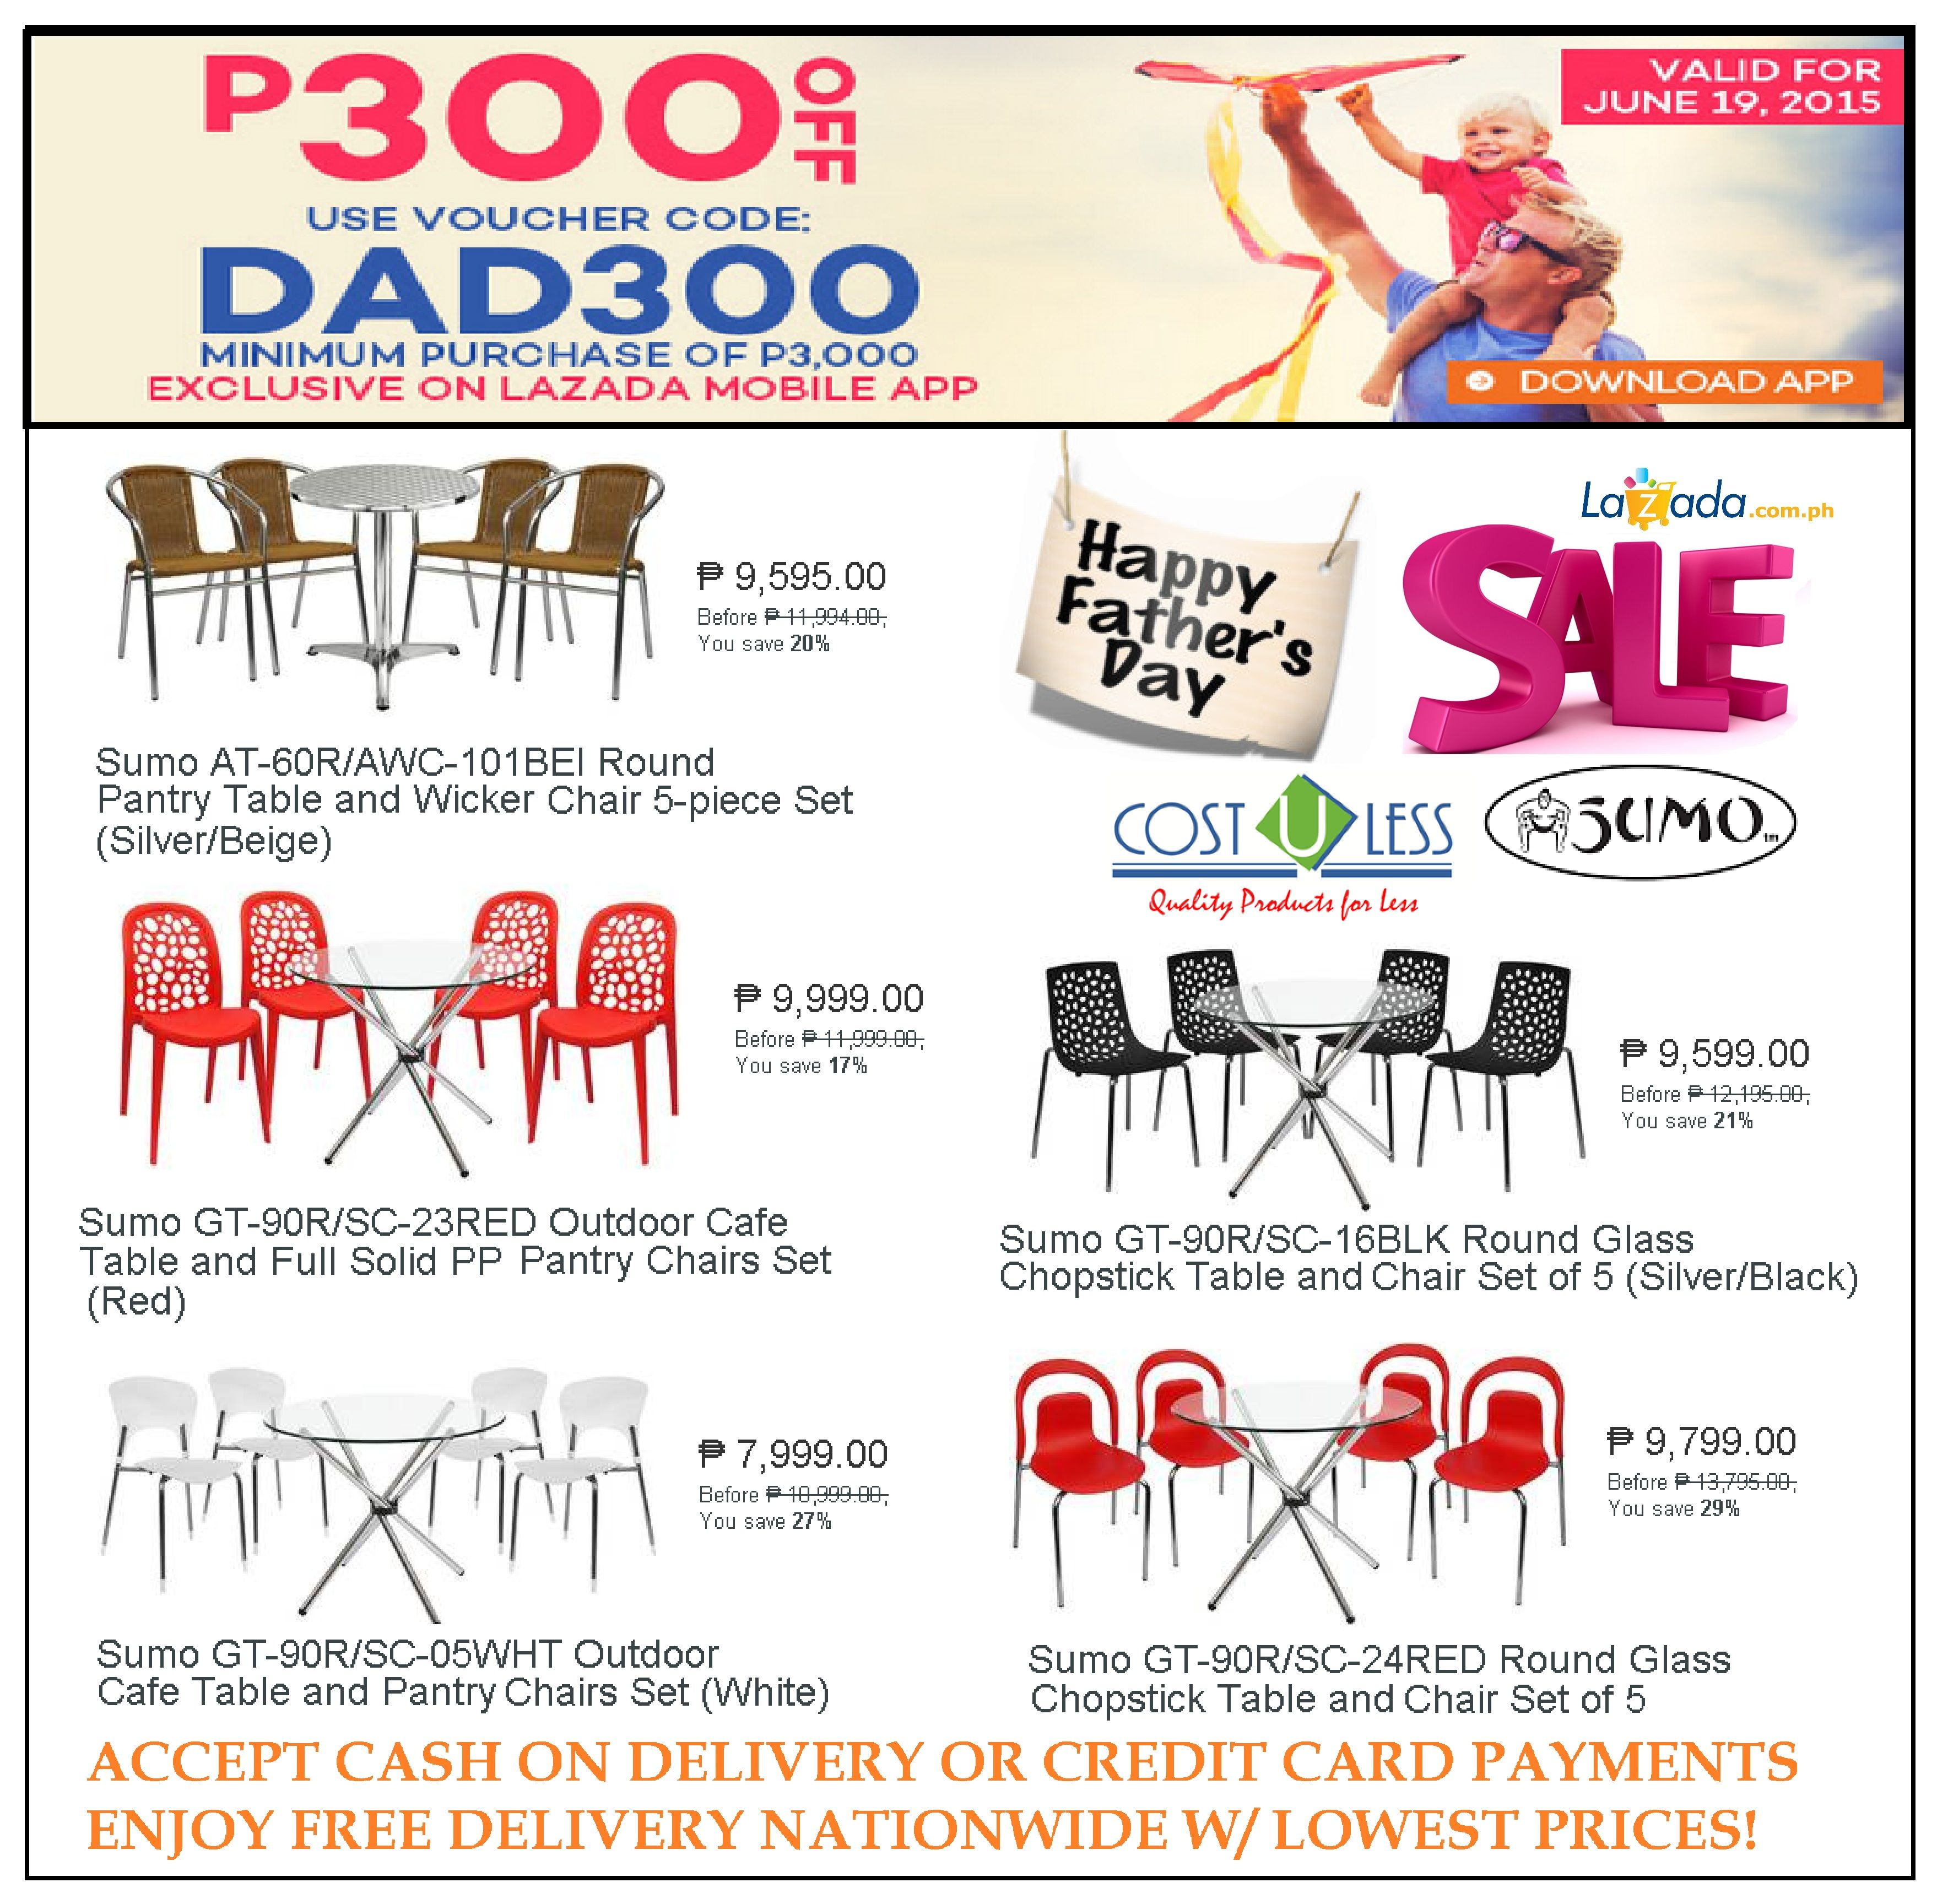 restaurant furniture sale lazada father s day promo save p300 00